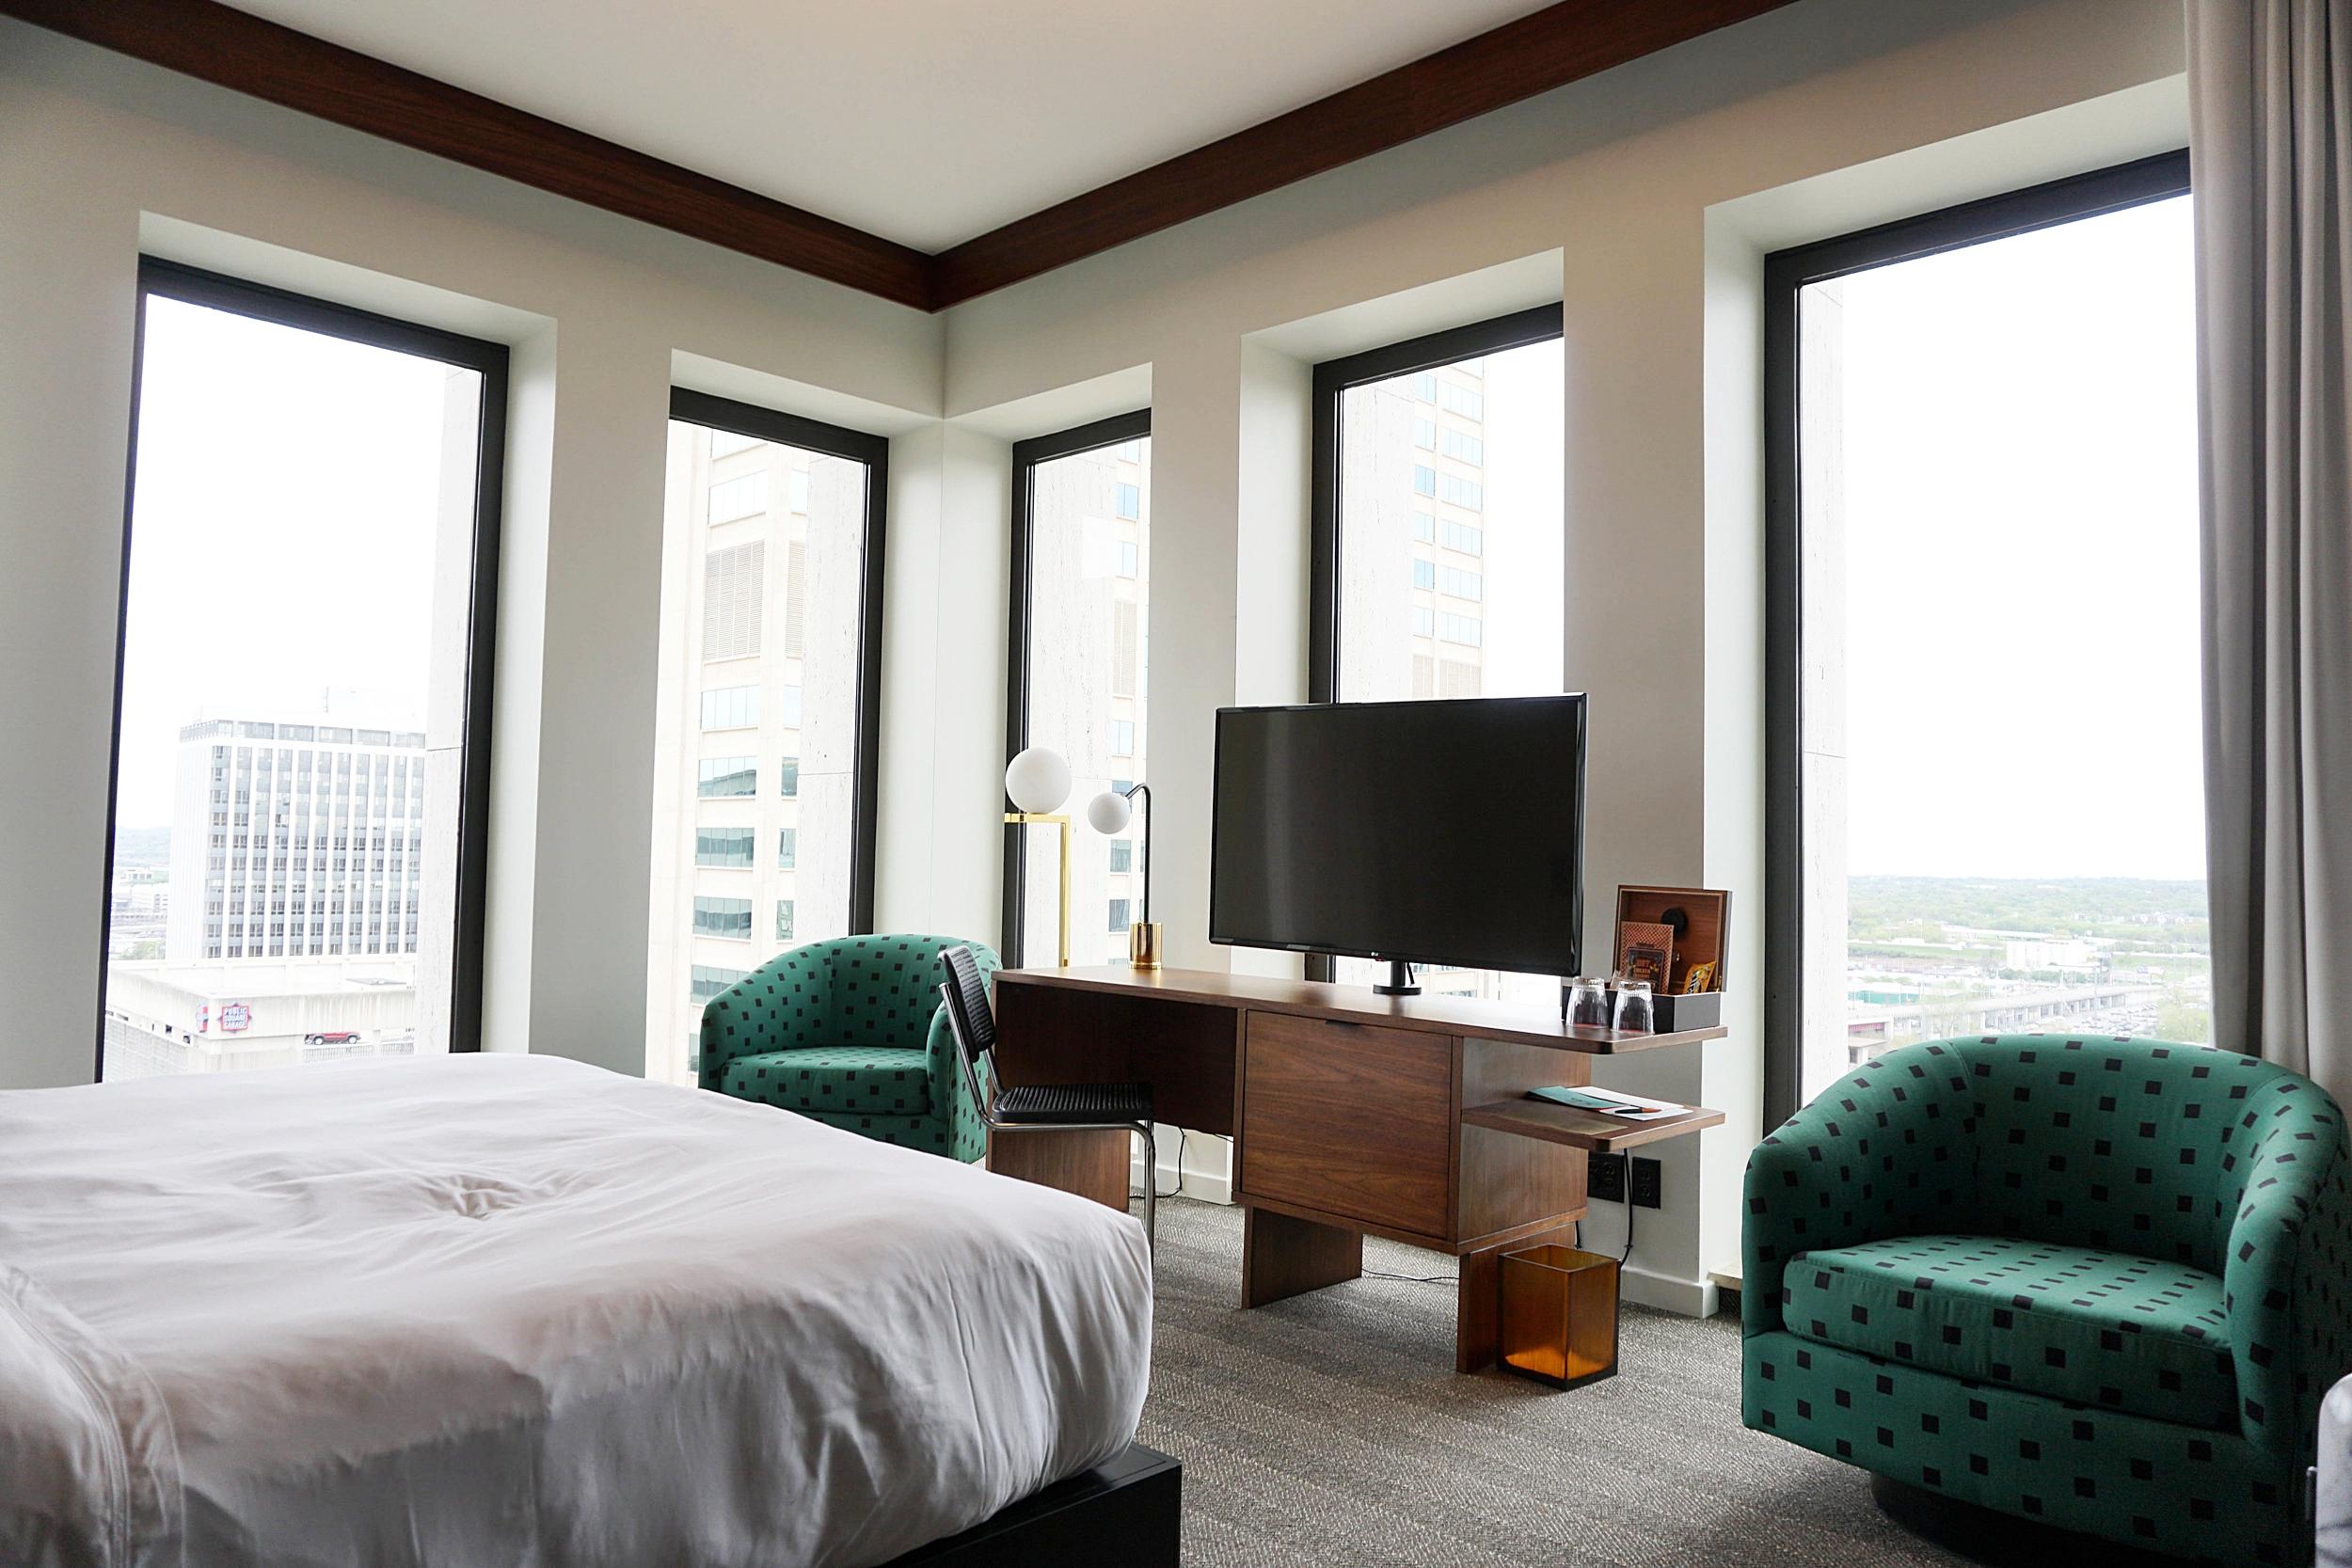 the-fairlane-nashville-tn-where-to-sleep-best-hotel.jpg